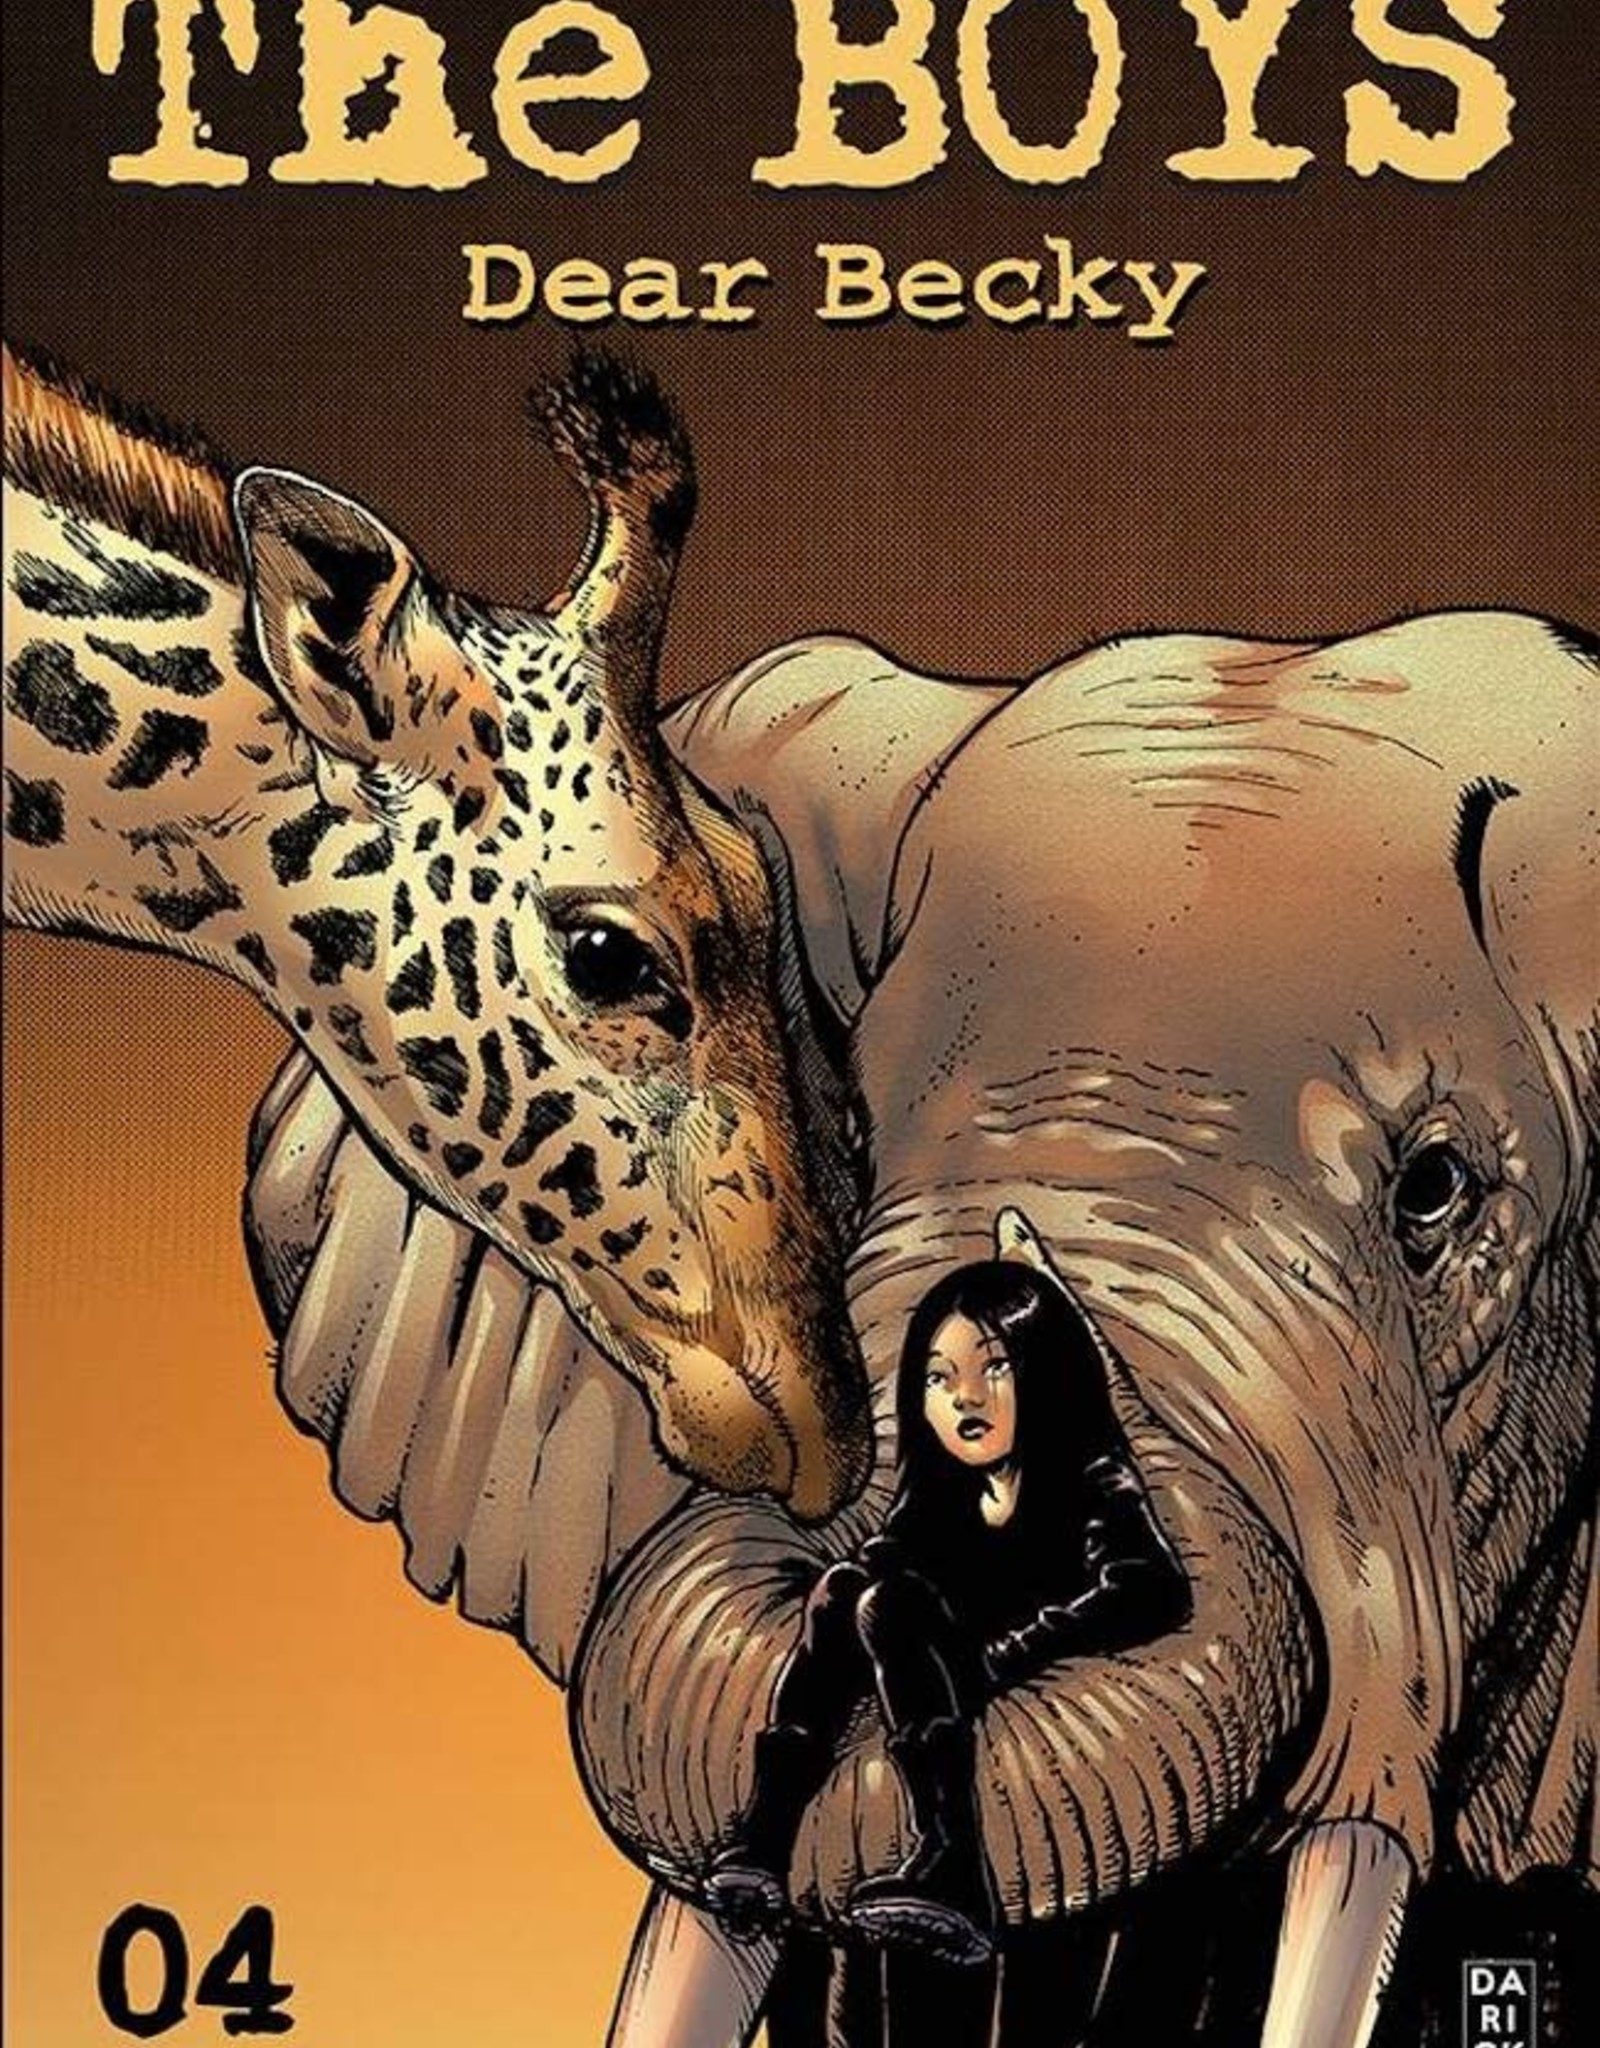 Dynamite Boys Dear Becky #5